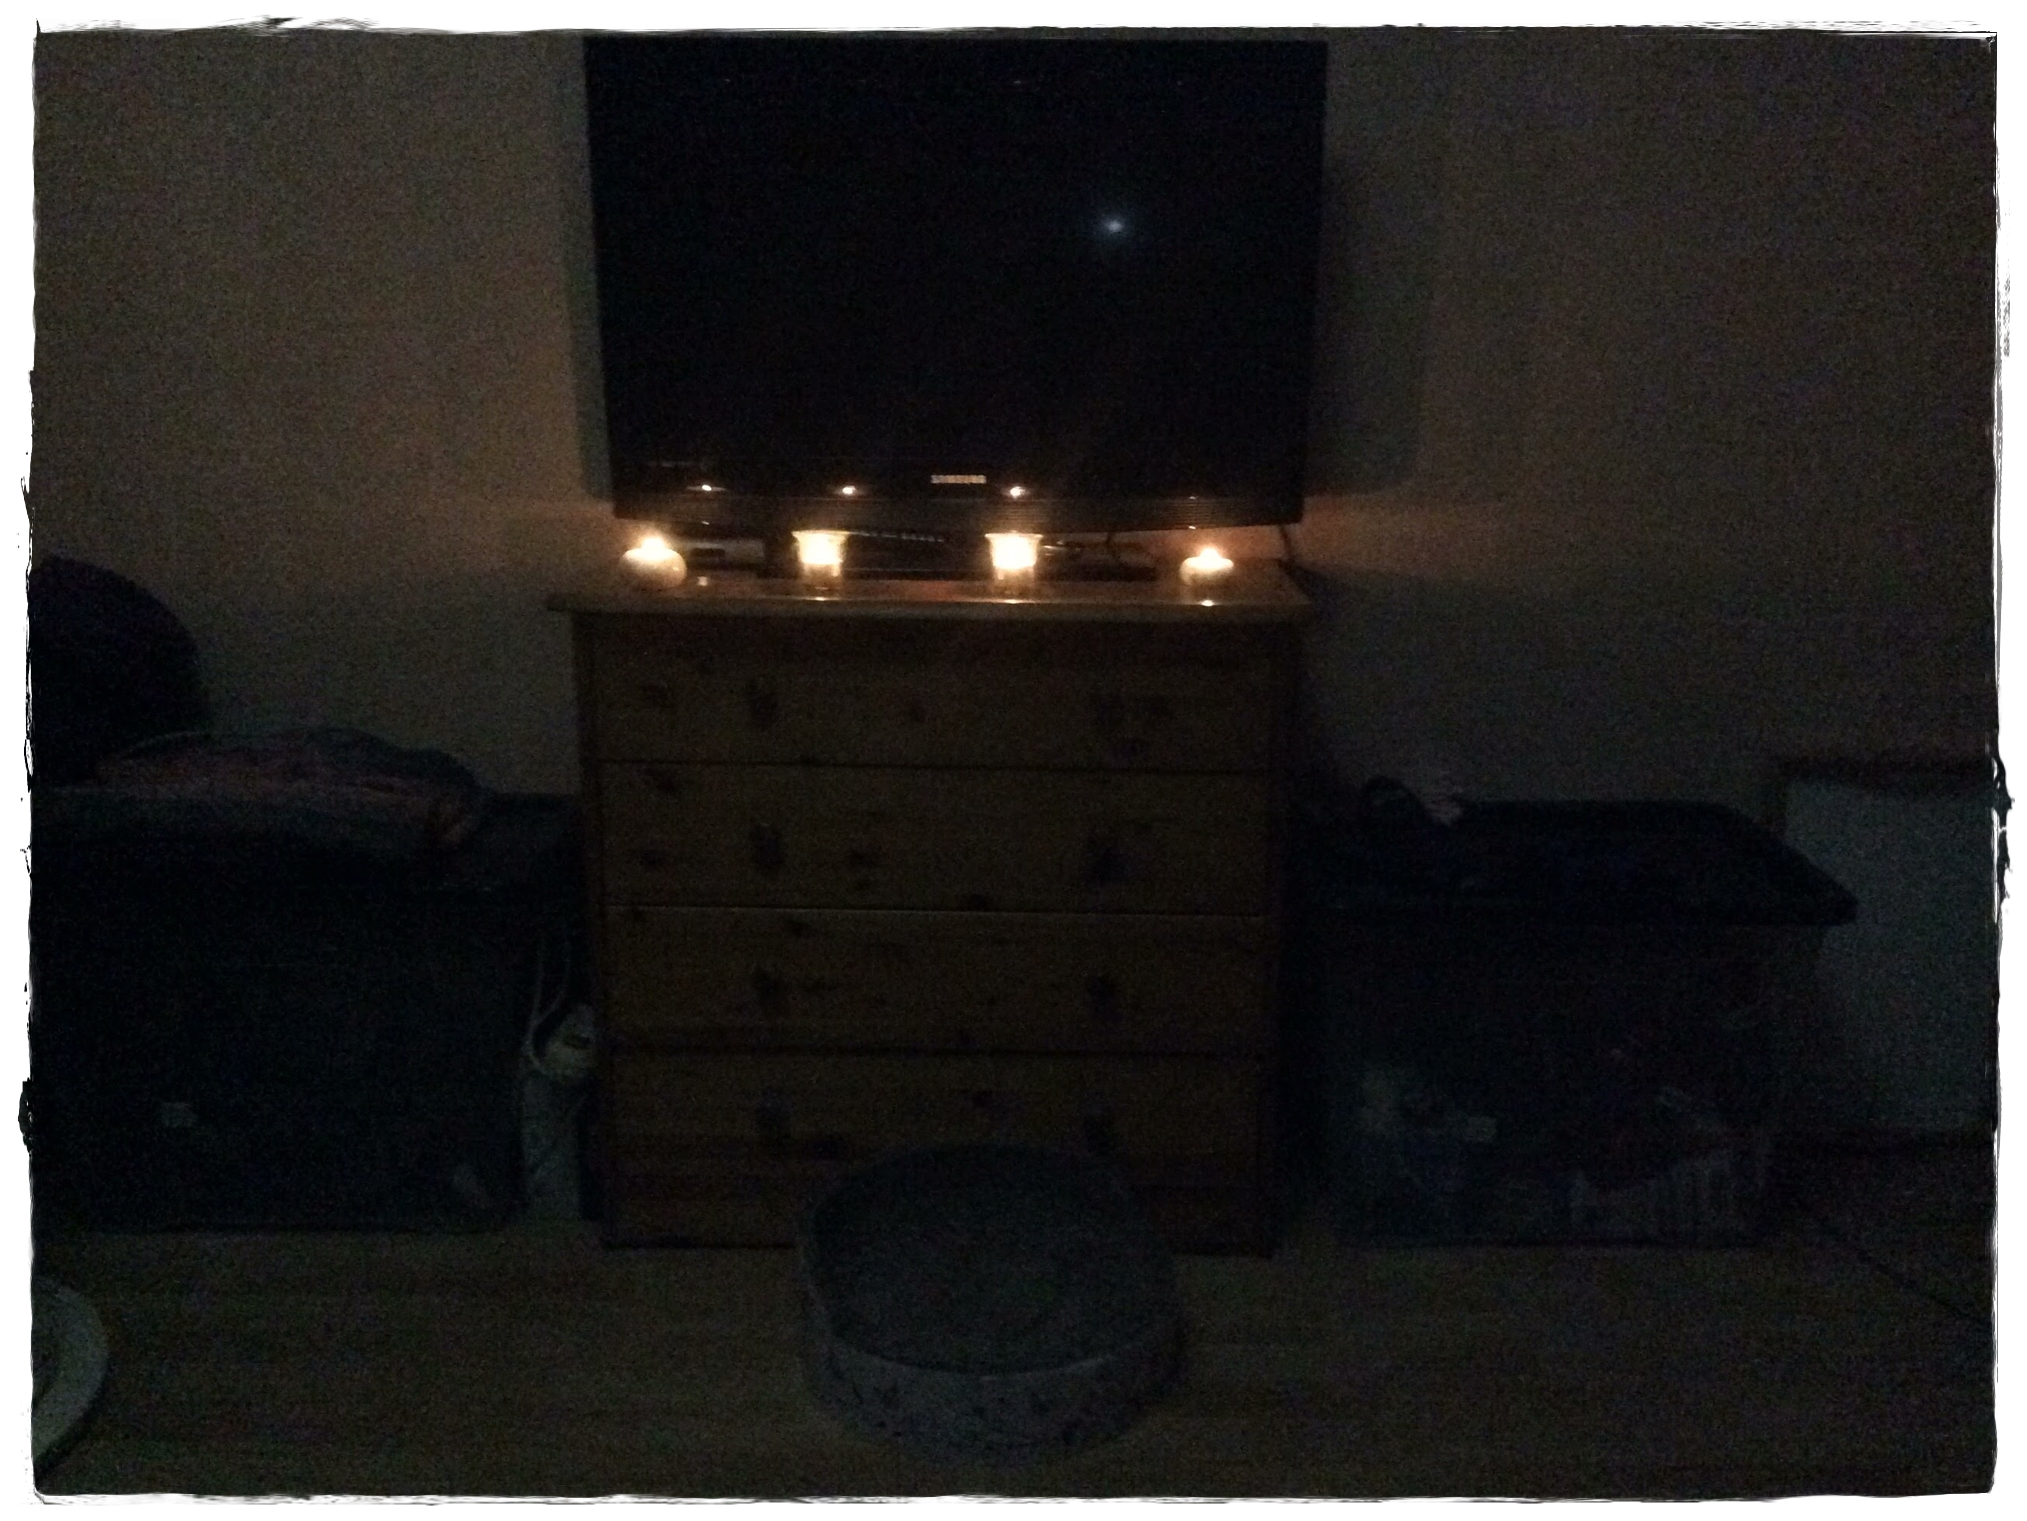 3. Advent mit abends ca. 4 Stunden Stromausfall